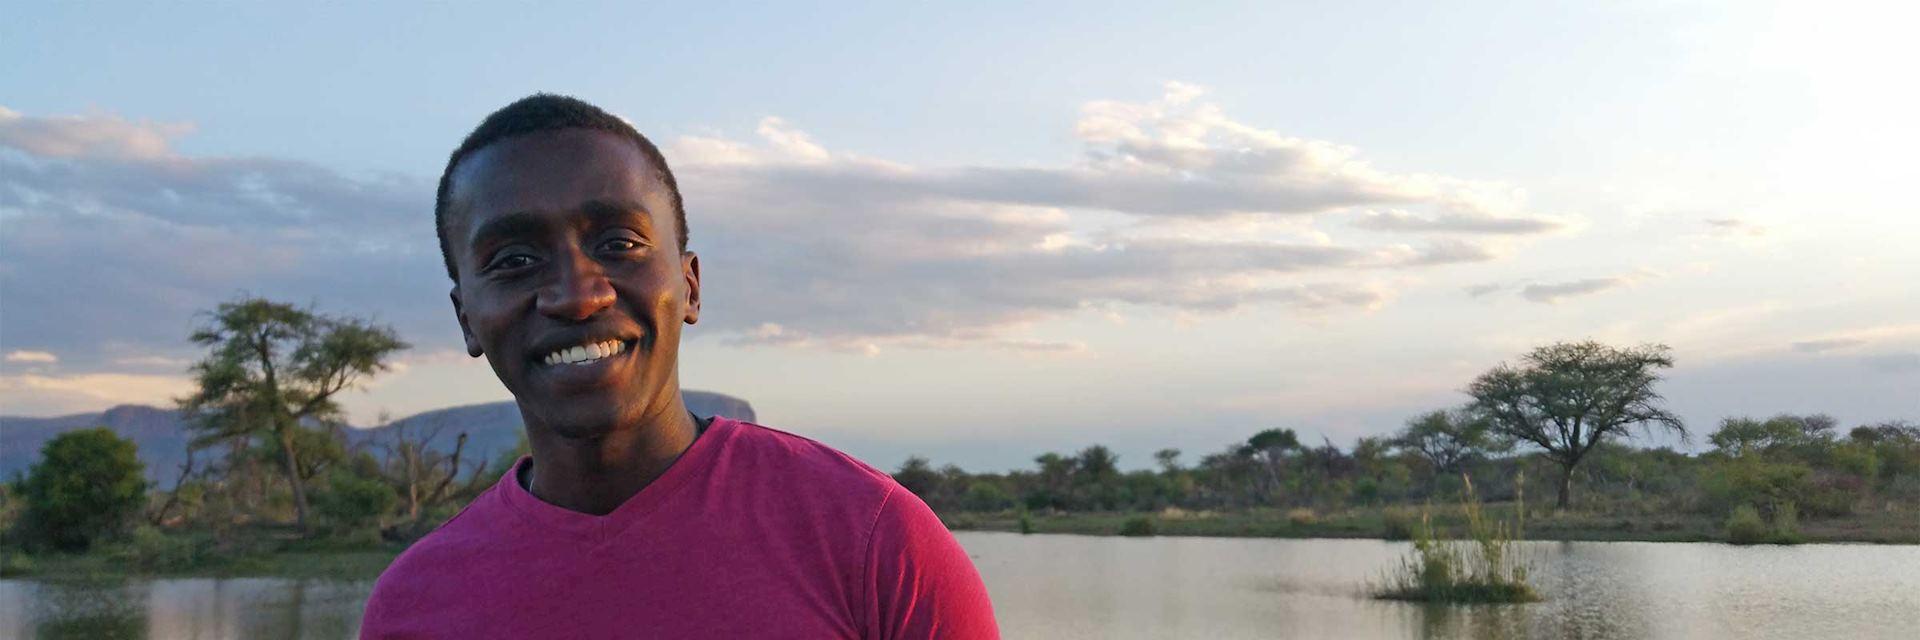 David at Marakele Park